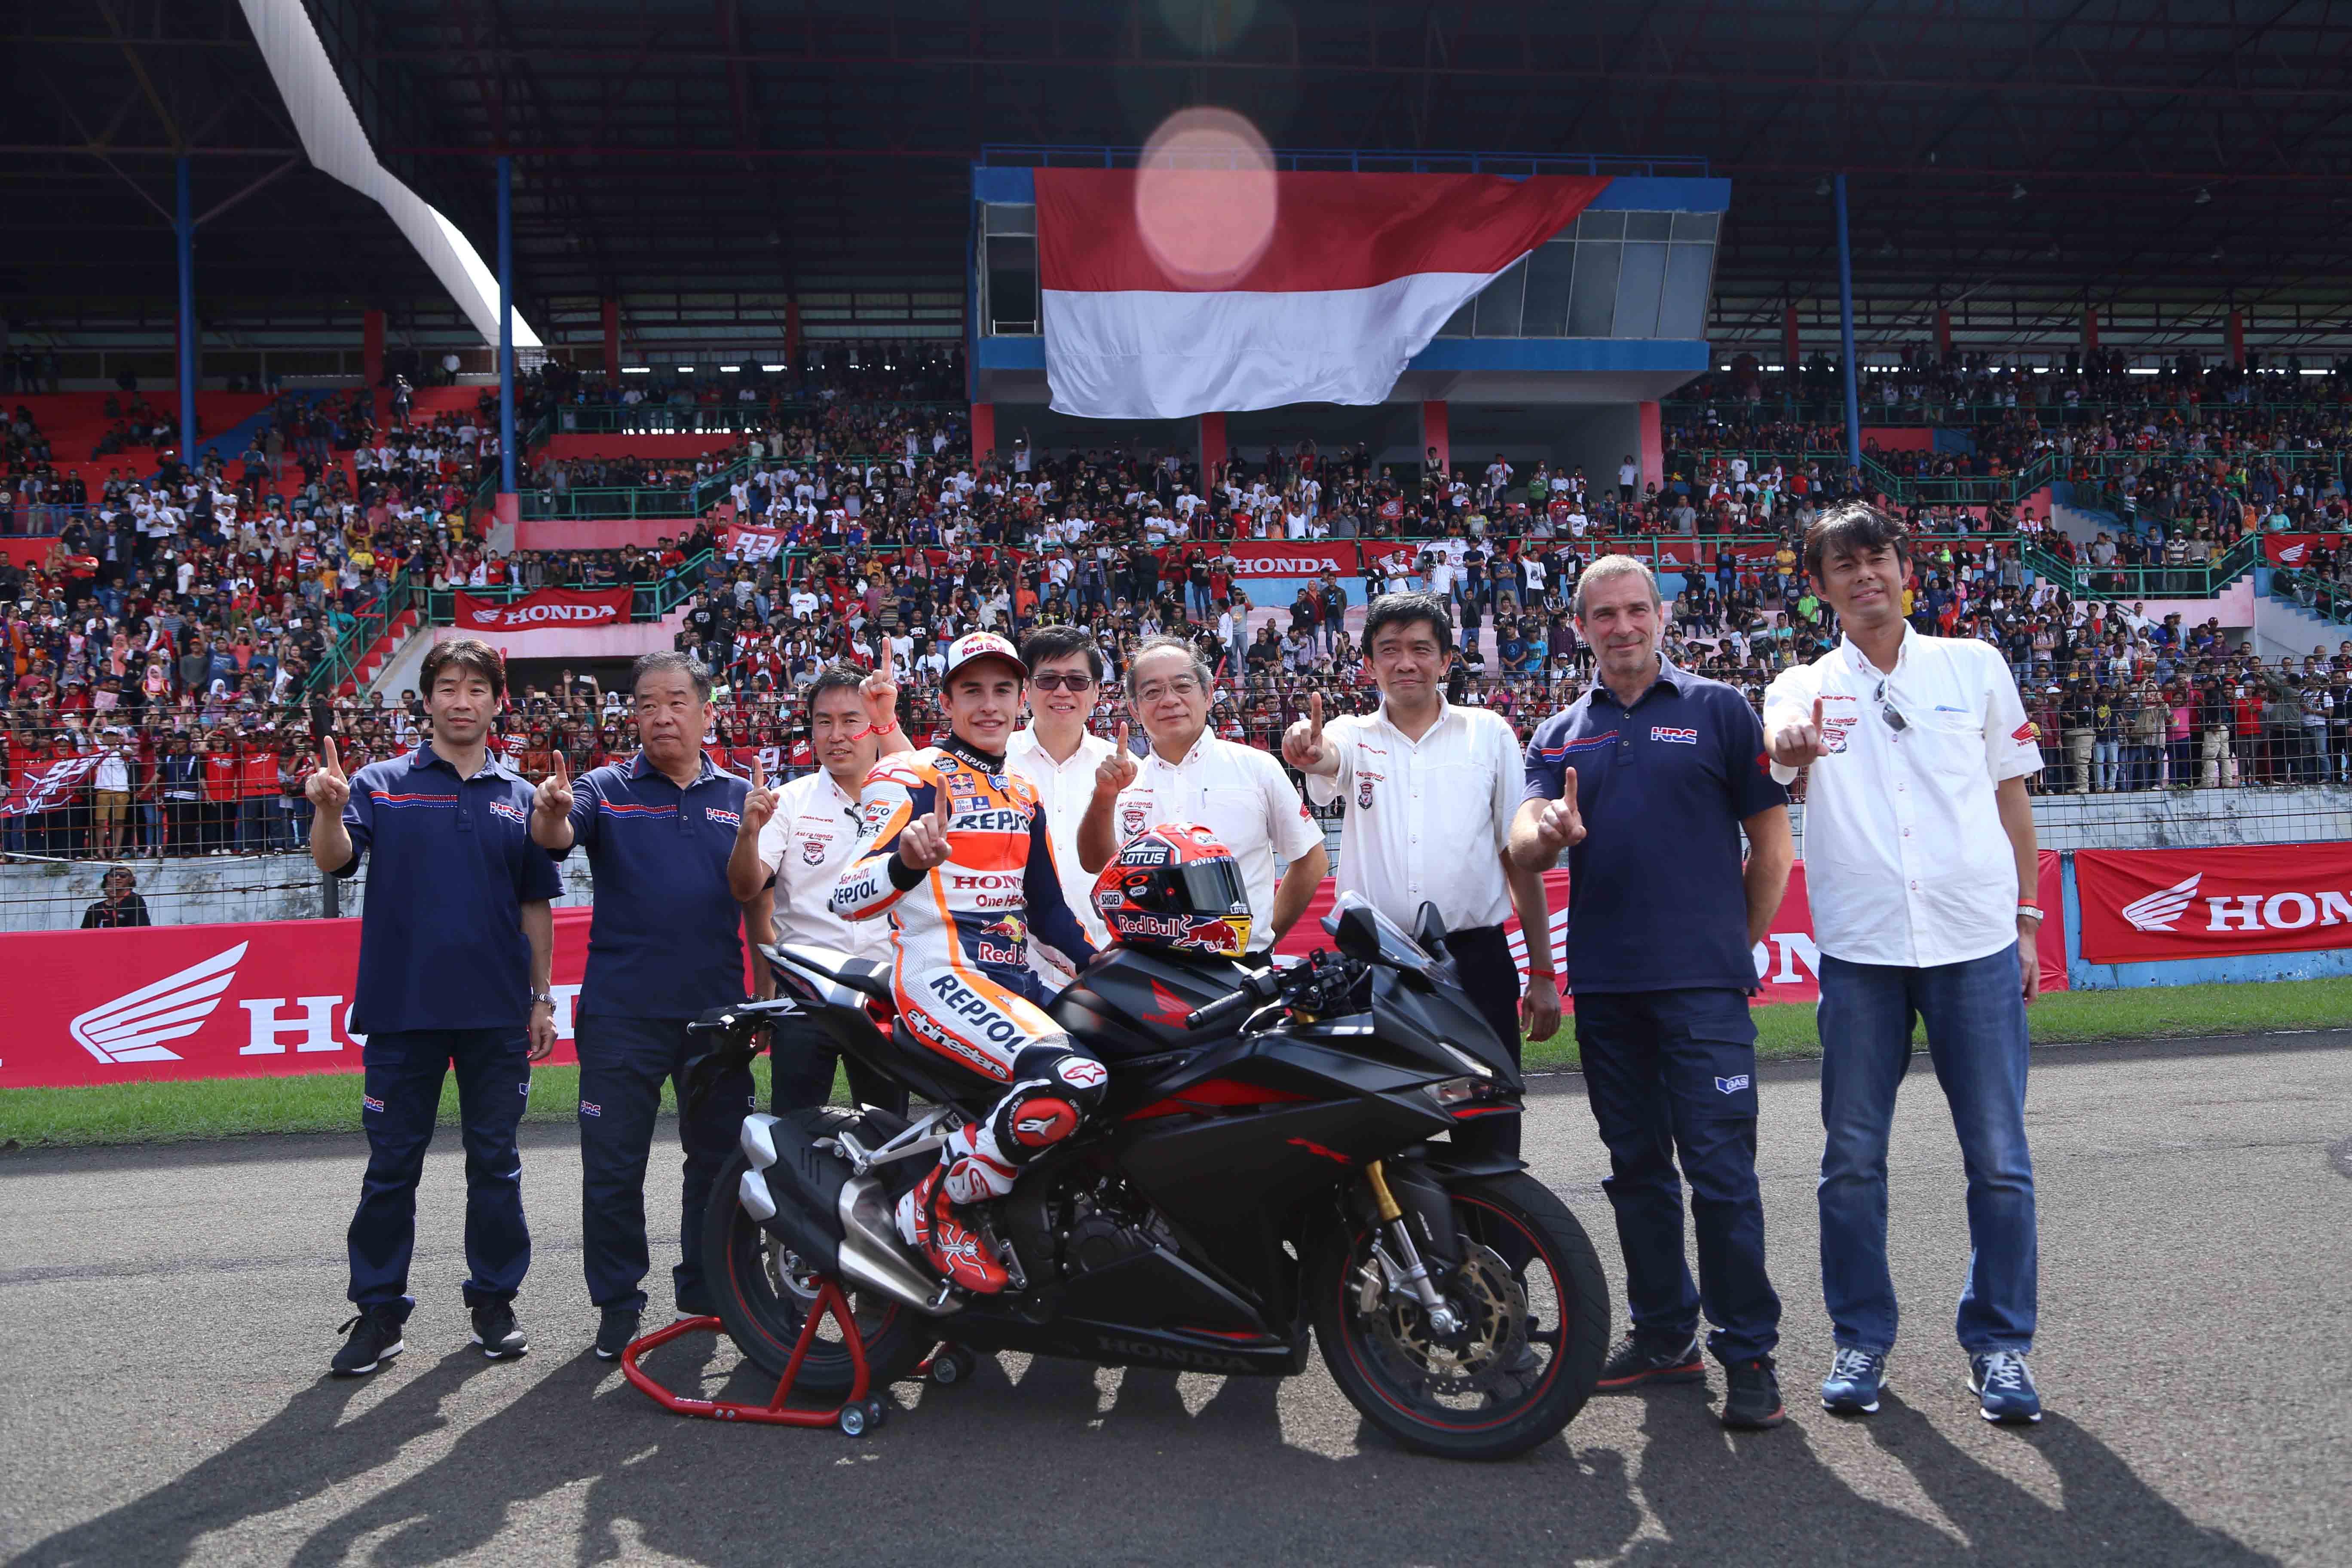 Marc Marquez Rayakan Titel Juara Dunia MotoGP 2016 Bersama Ribuan Fans di Sentul. Sekaligus ajang Geber Honda CBR250RR